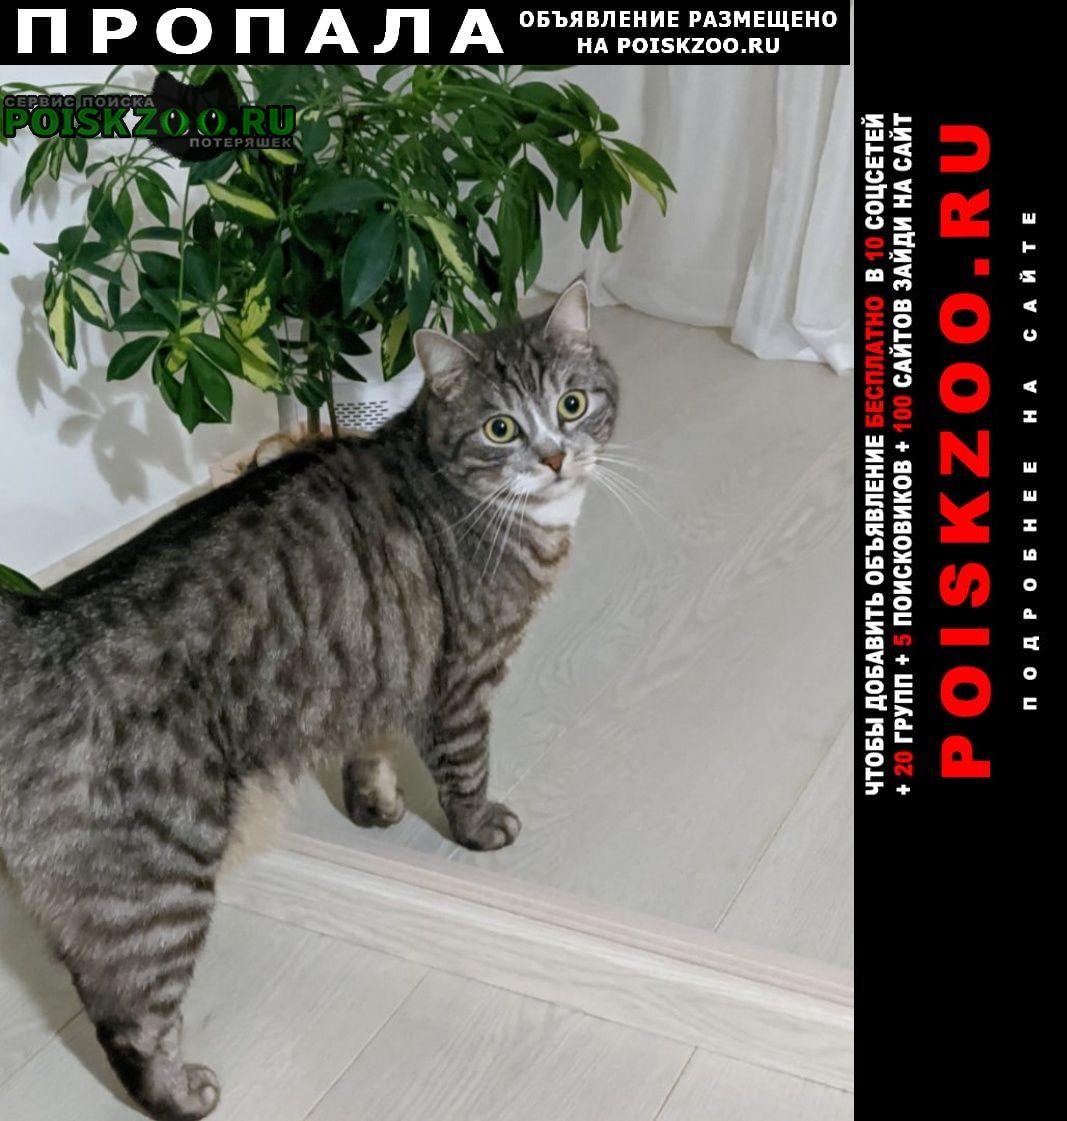 Тула Пропал кот